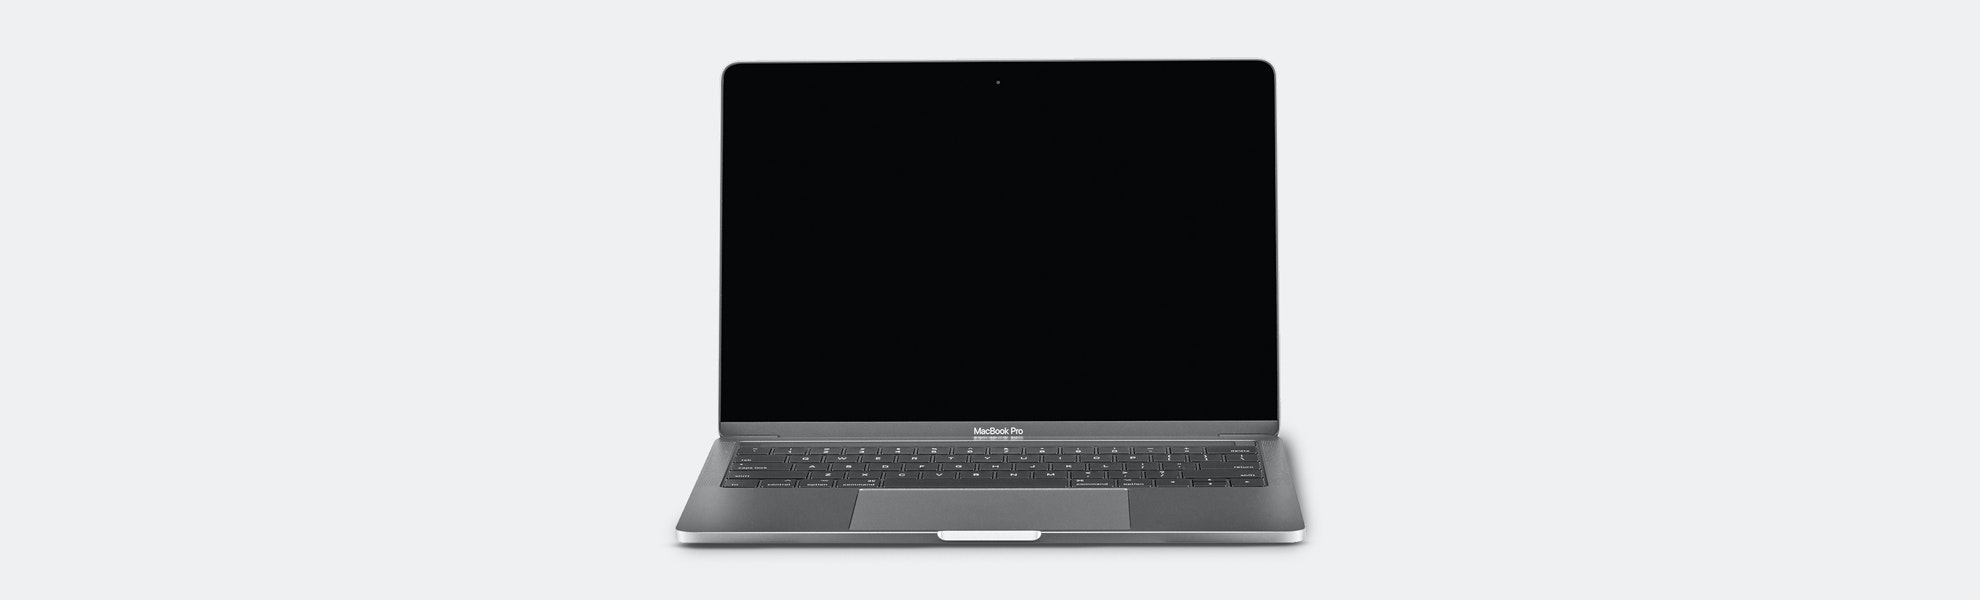 "Apple 13.3"" MacBook Pro 5PXV2LL/A - Mid 2017"